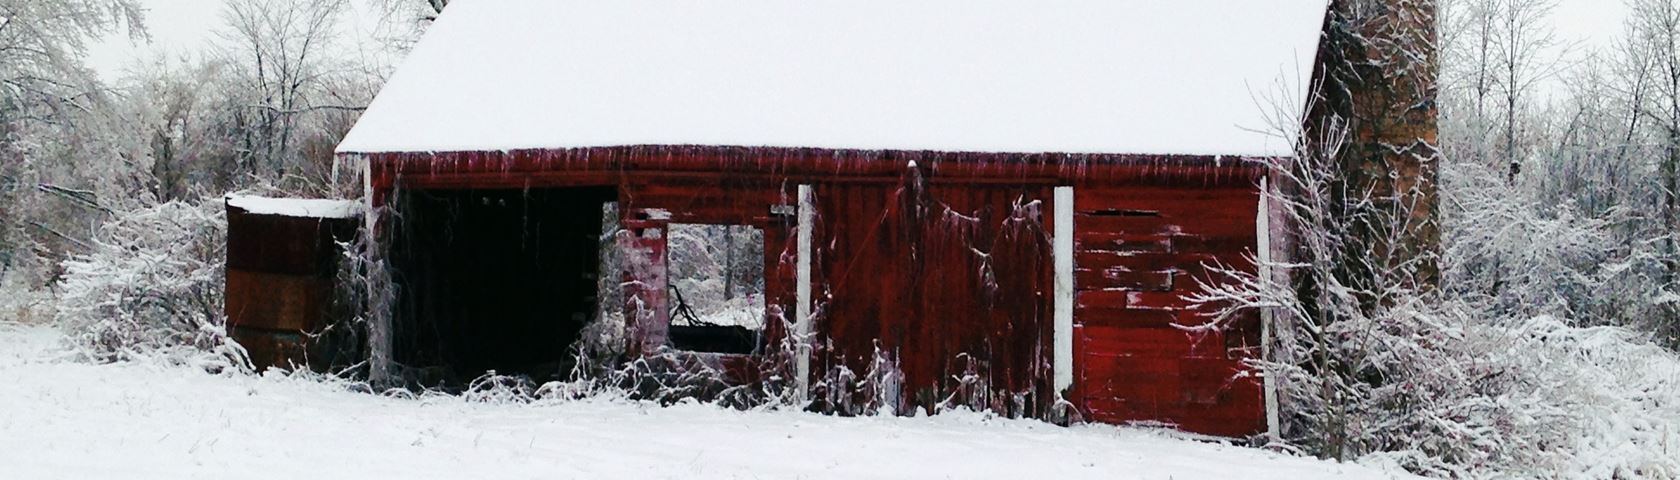 Winter Barn Side View